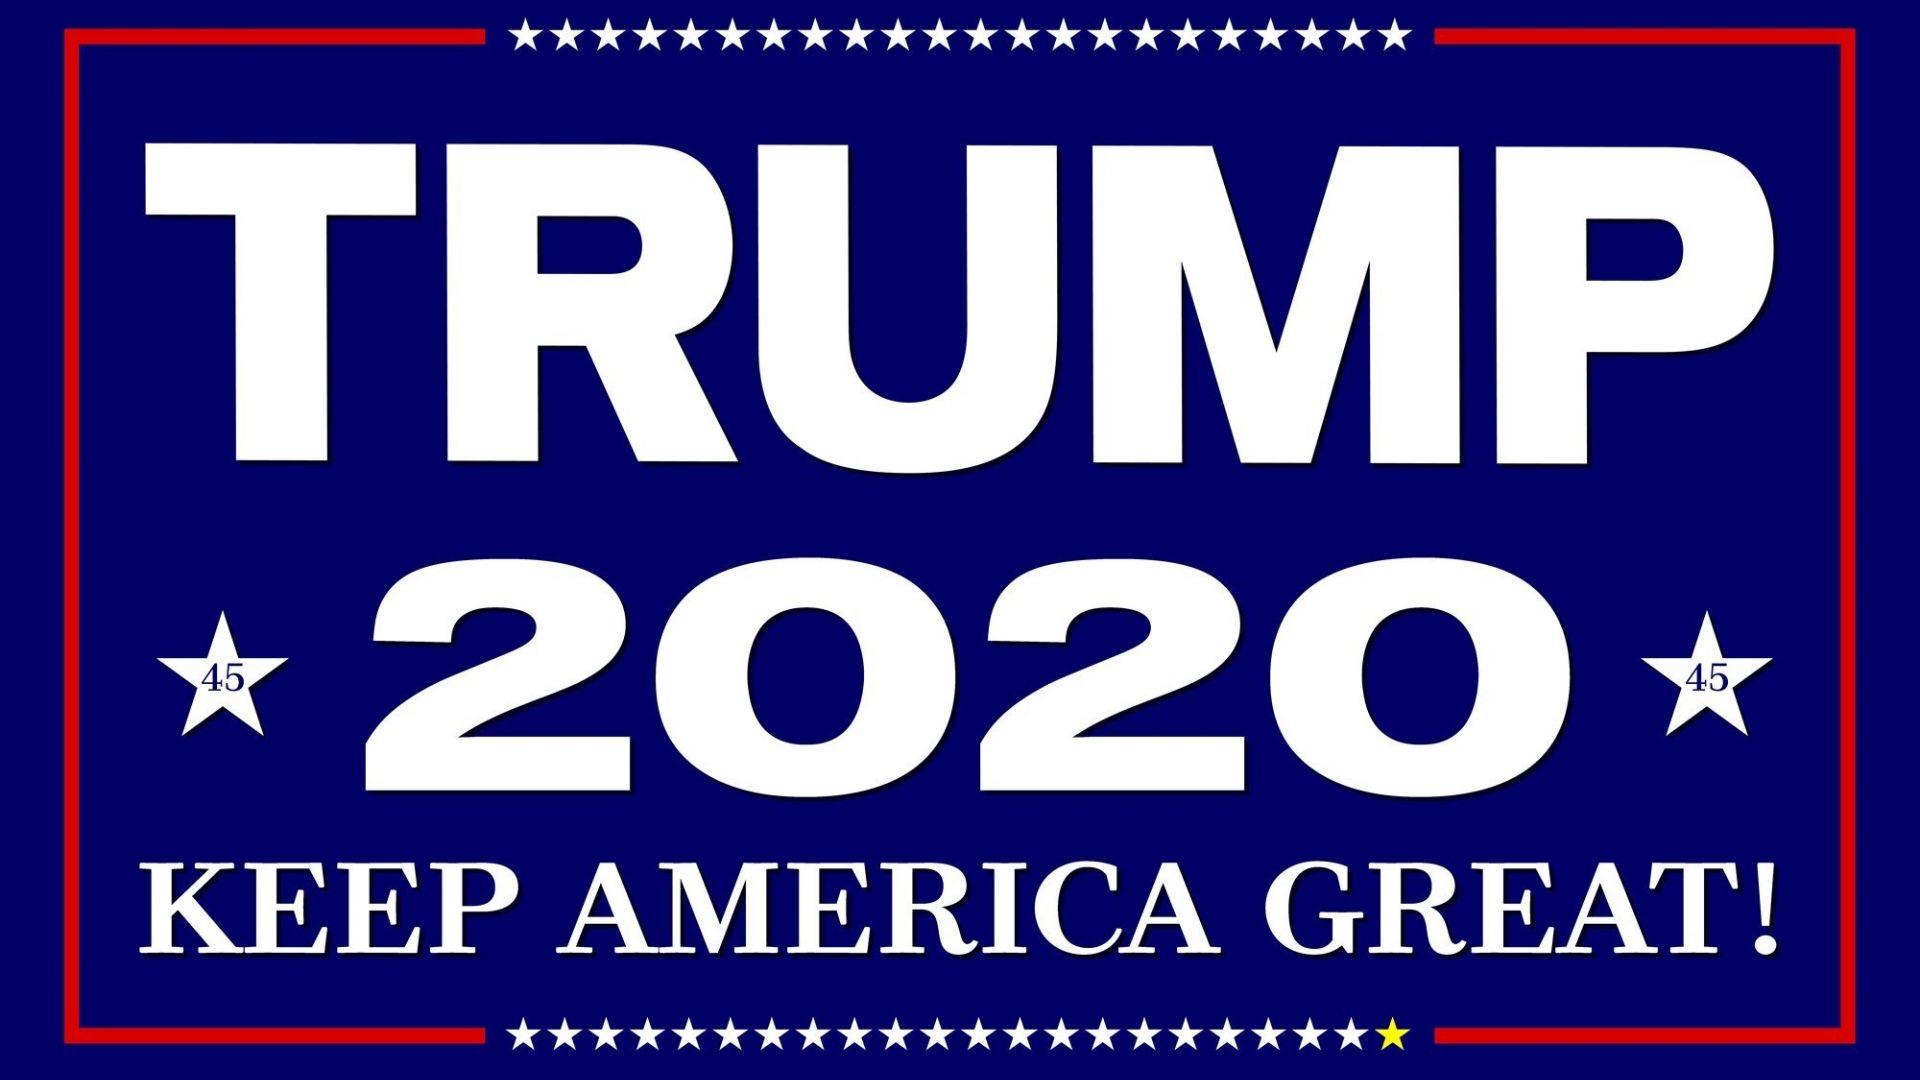 Trump 2020 Computer Wallpapers 1920x1080